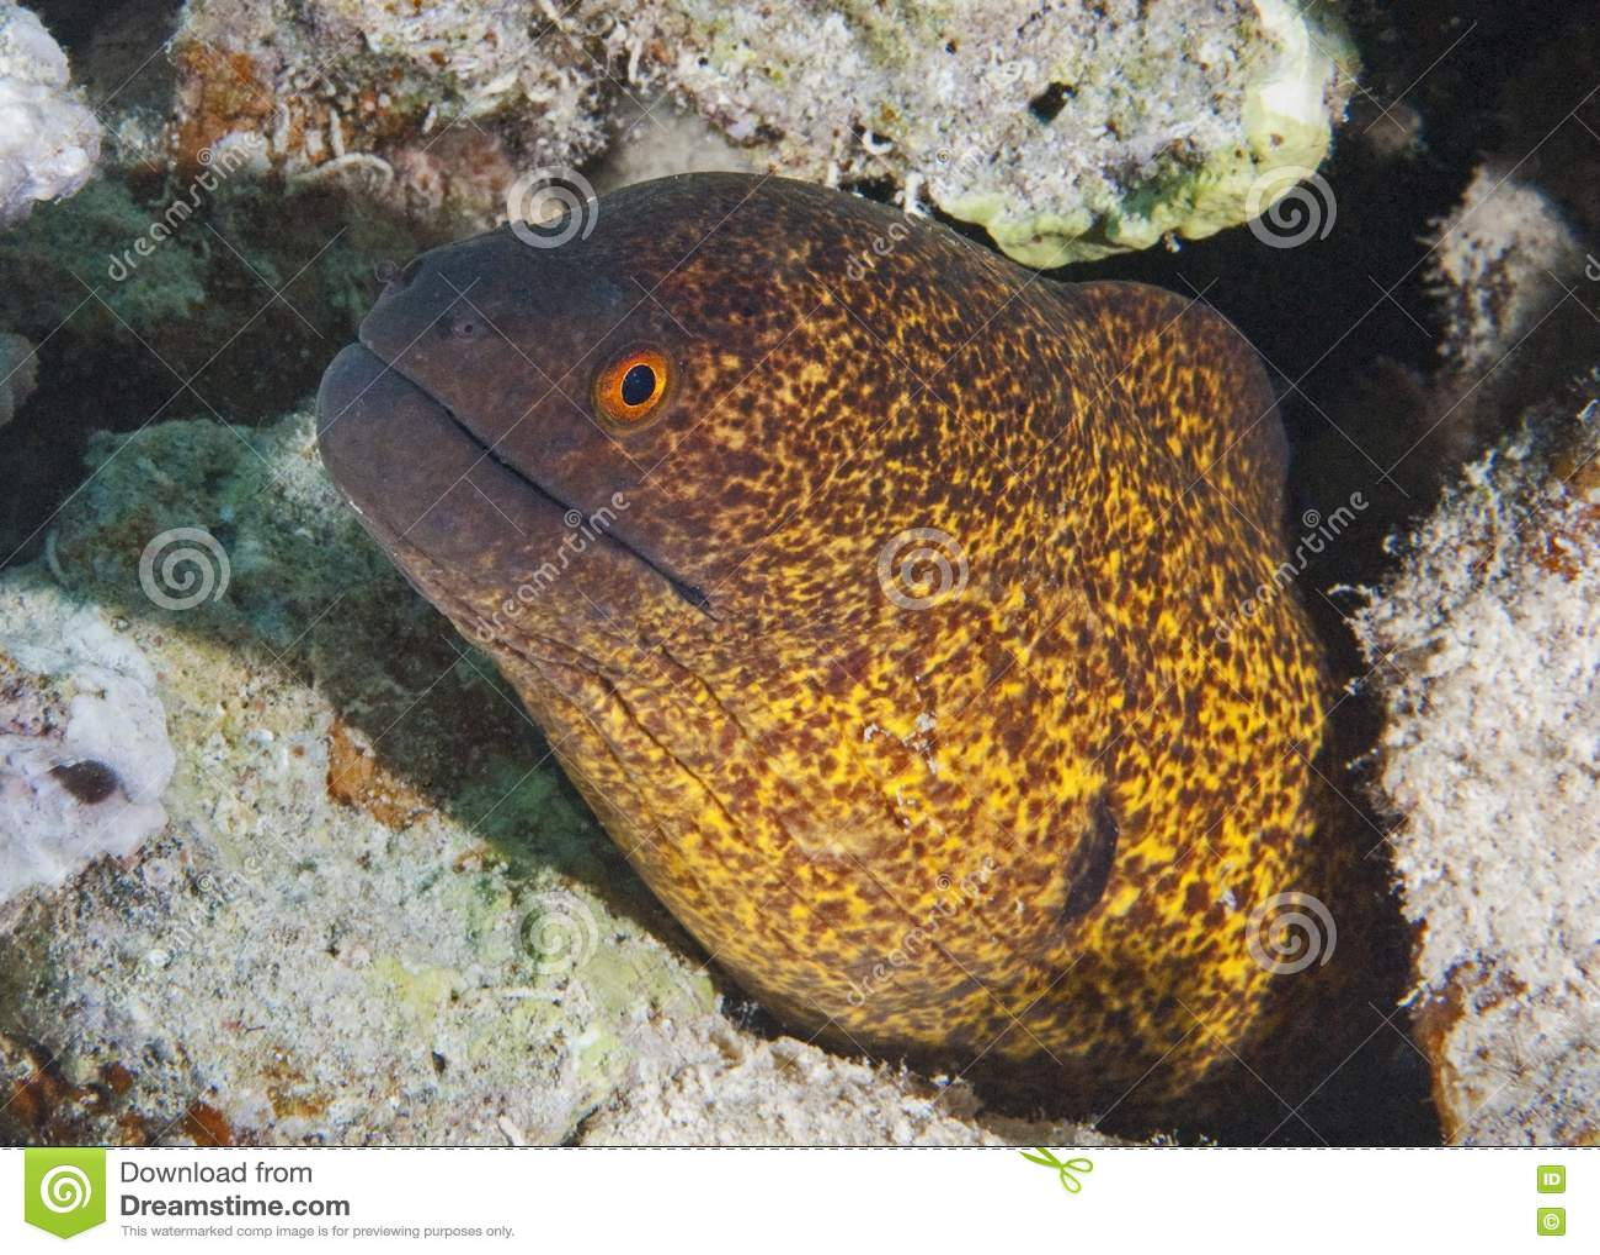 how to cook yellow eel